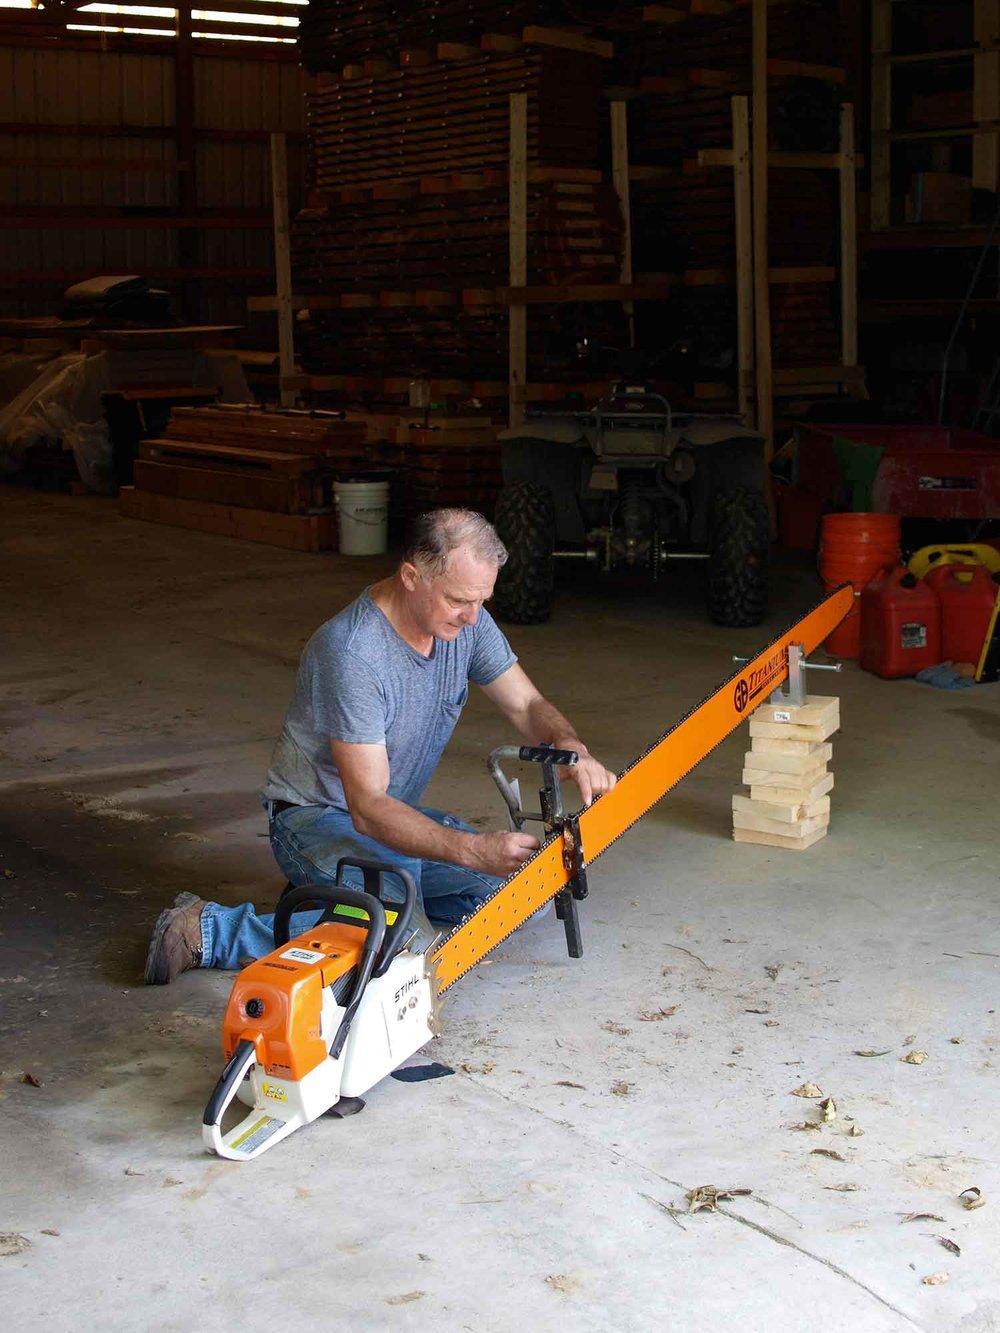 sawmill-selects-8150416.jpg